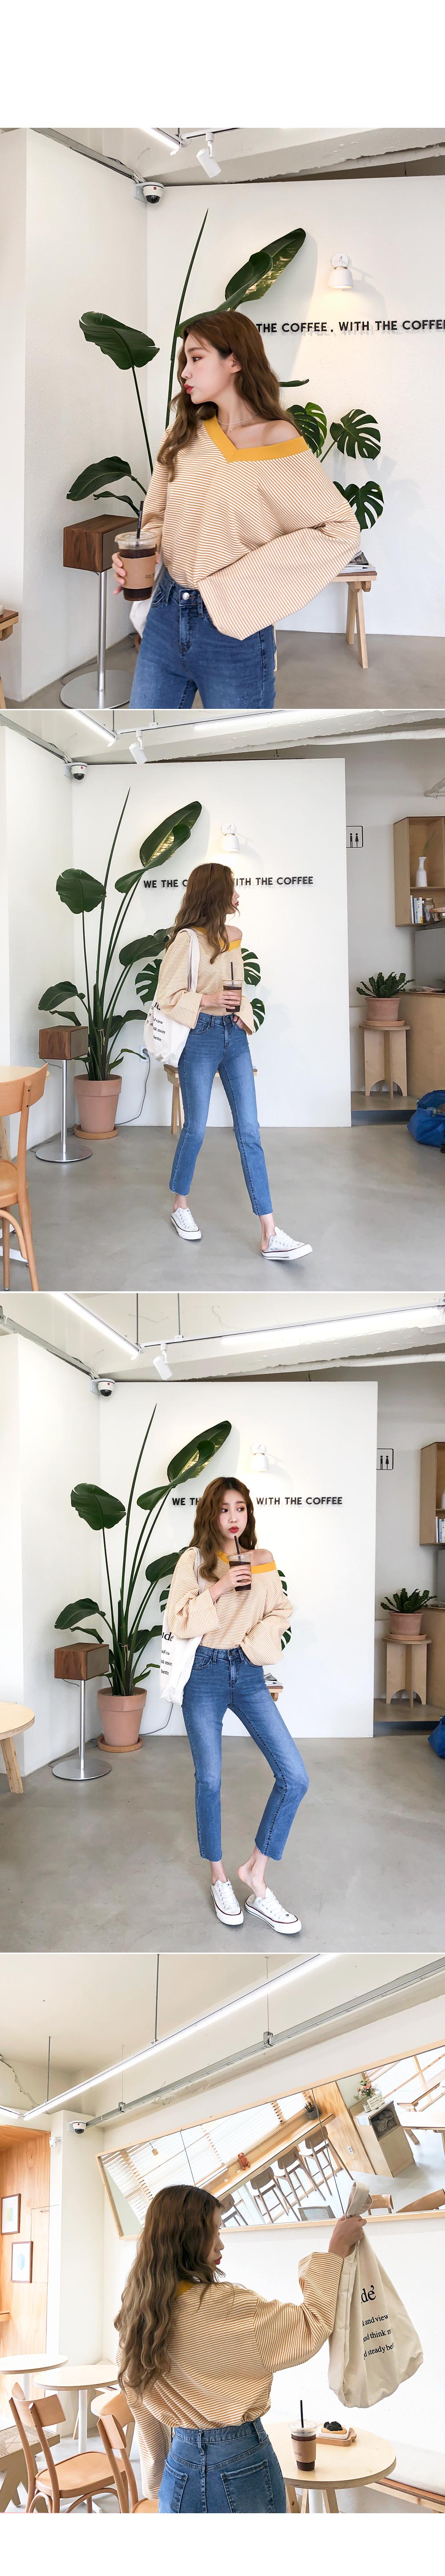 Small-size denim pants